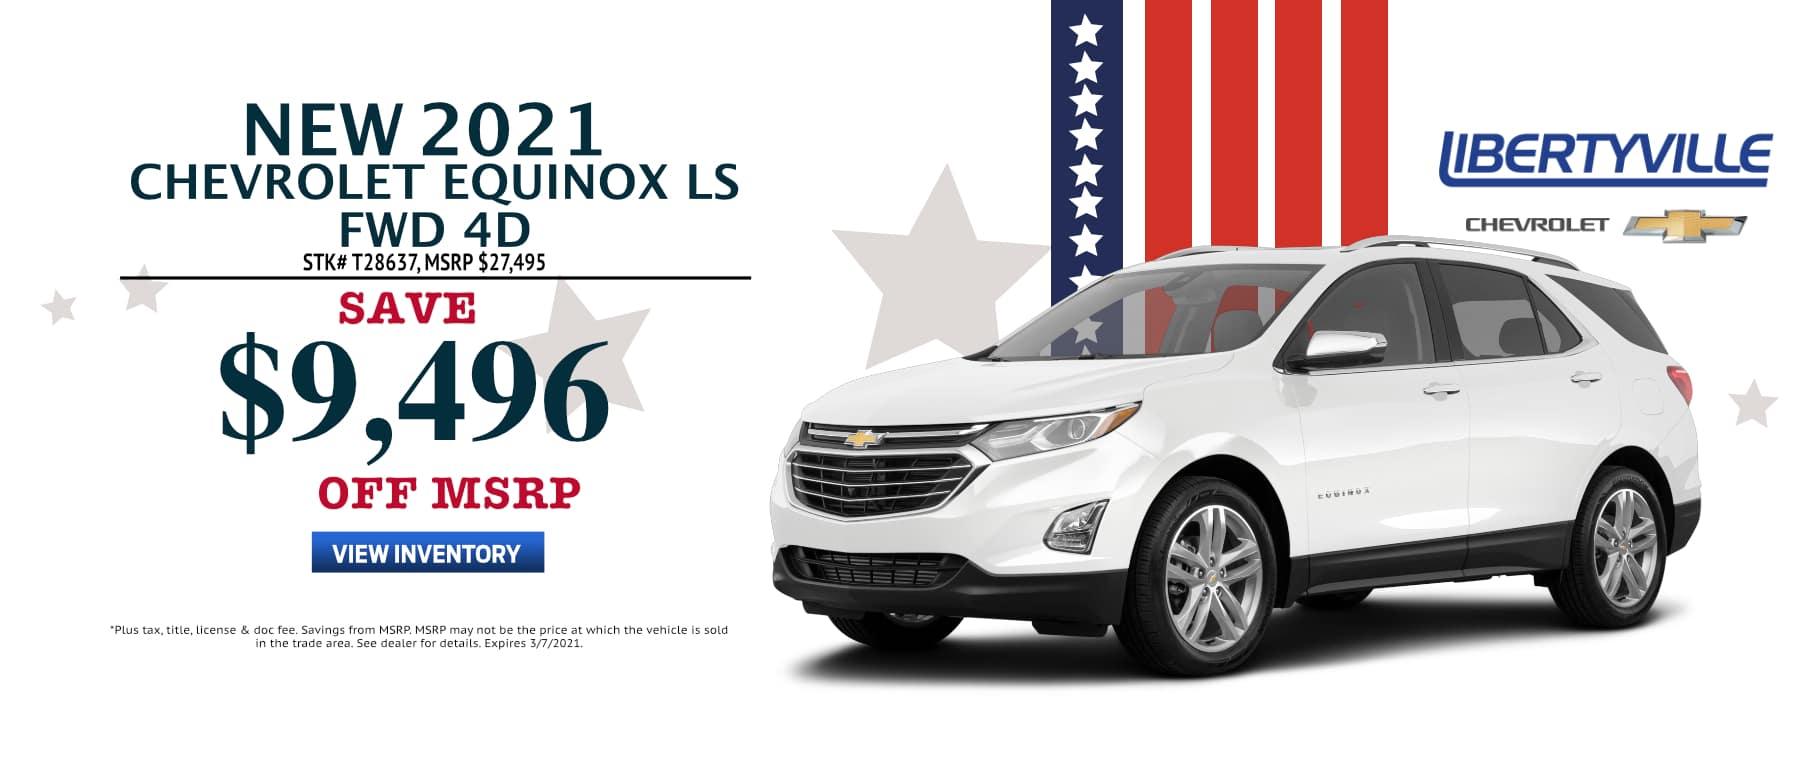 February_2021_Equinox_Libertyvilee_Chevrolet